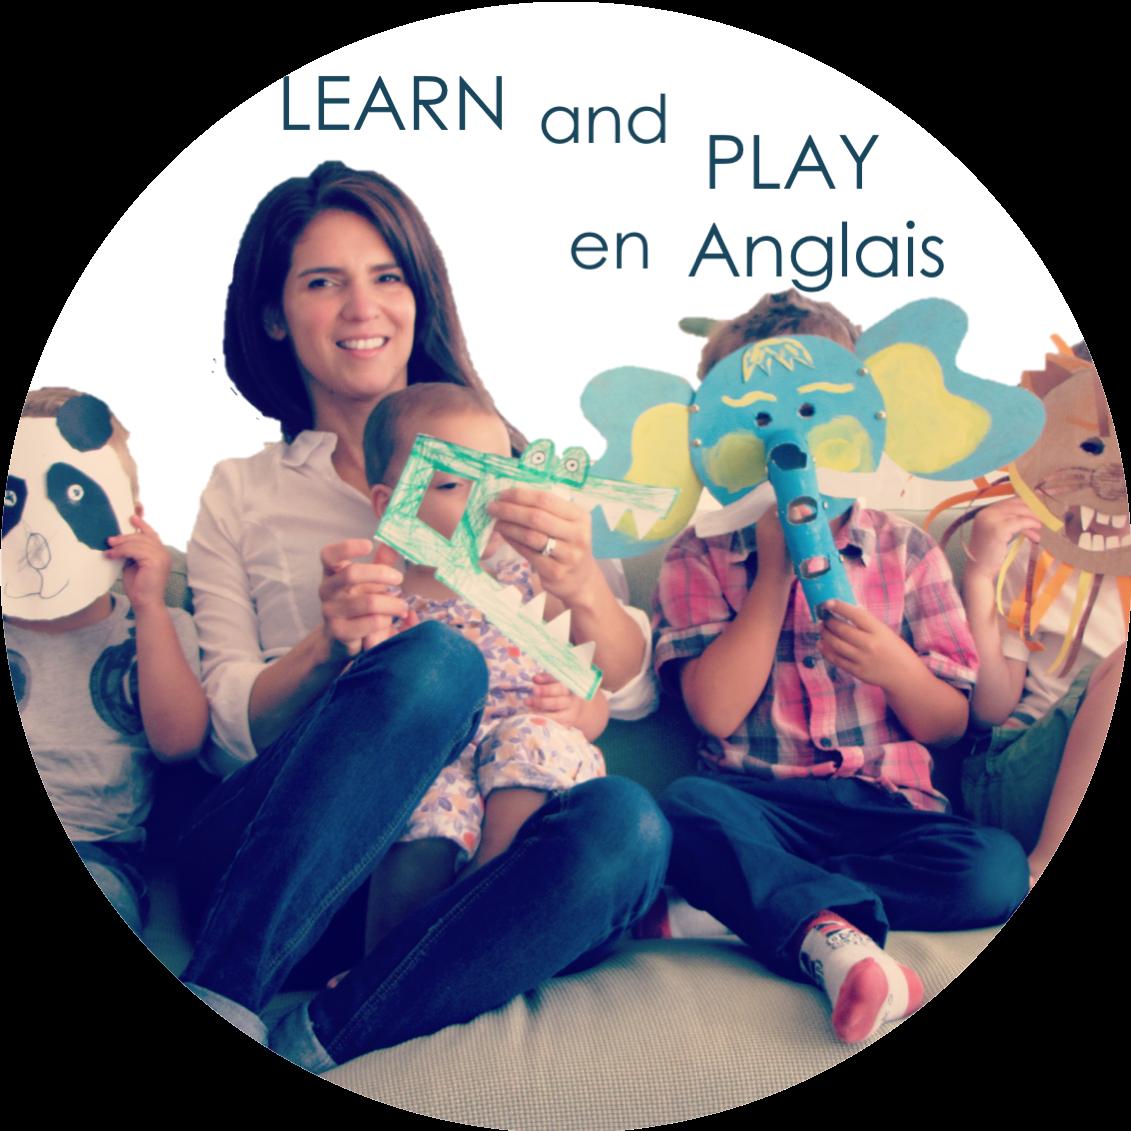 Learn and Play en Anglais